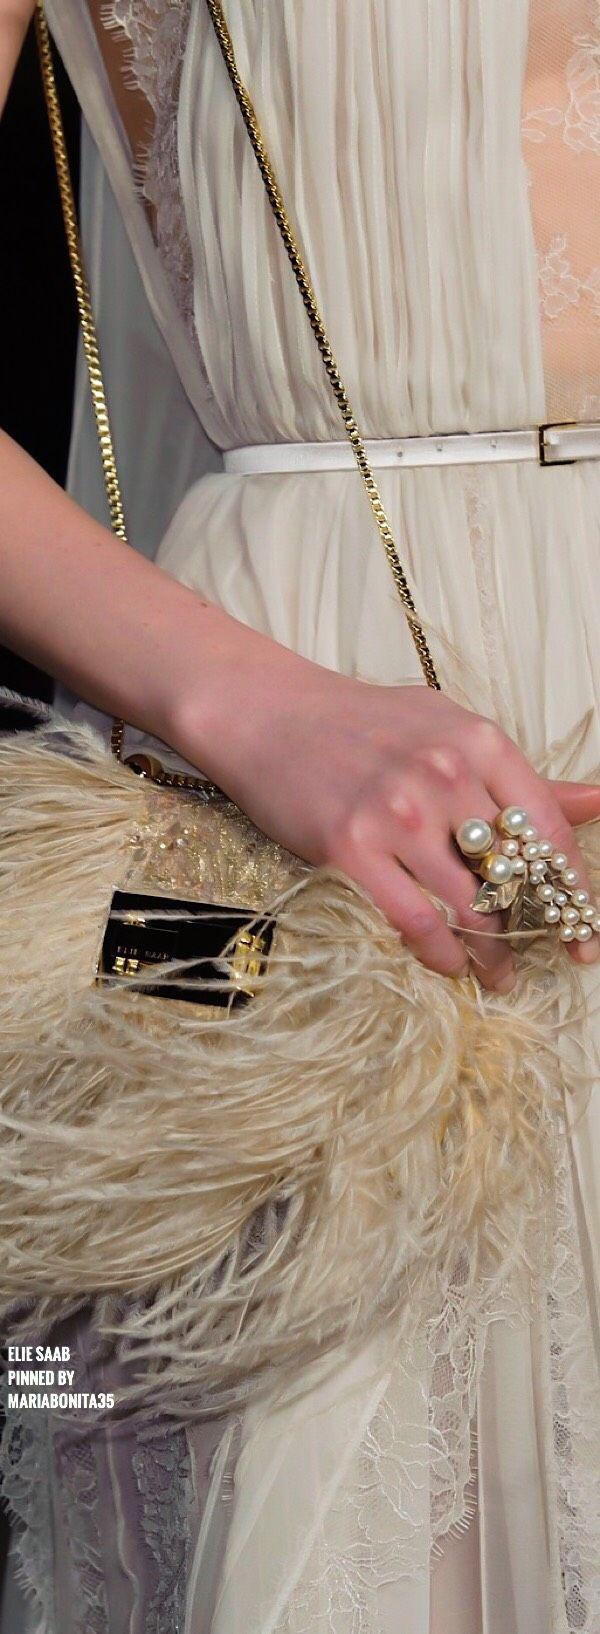 Elie Saab Spring-15 Haute Couture Details